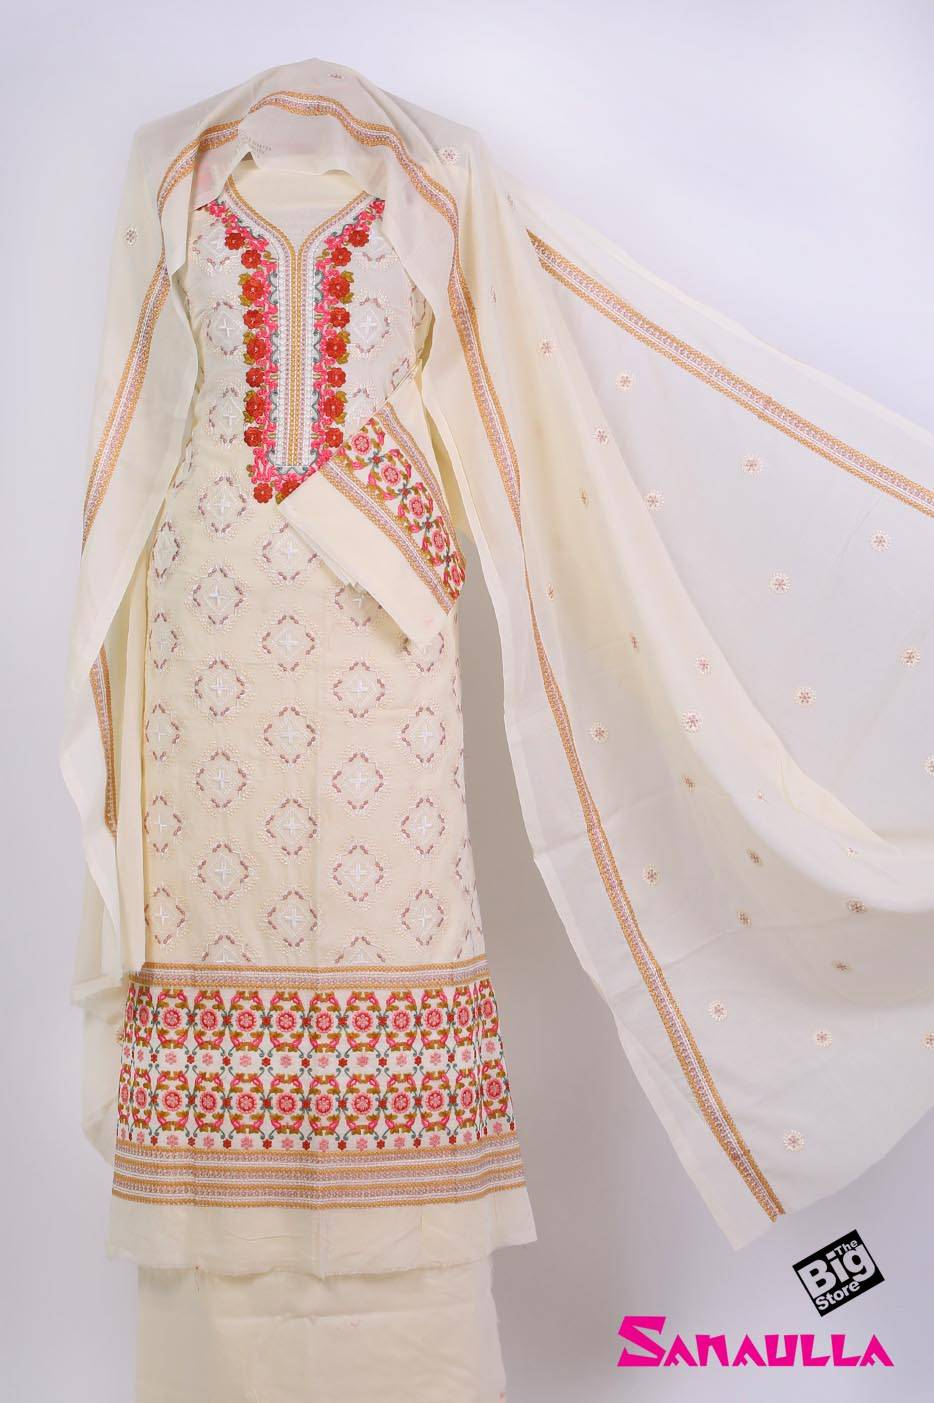 Sanaulla Exclusive Range Embroidered Swiss Voile Unstitched 3 Piece Suit SAZZ 706 Off White